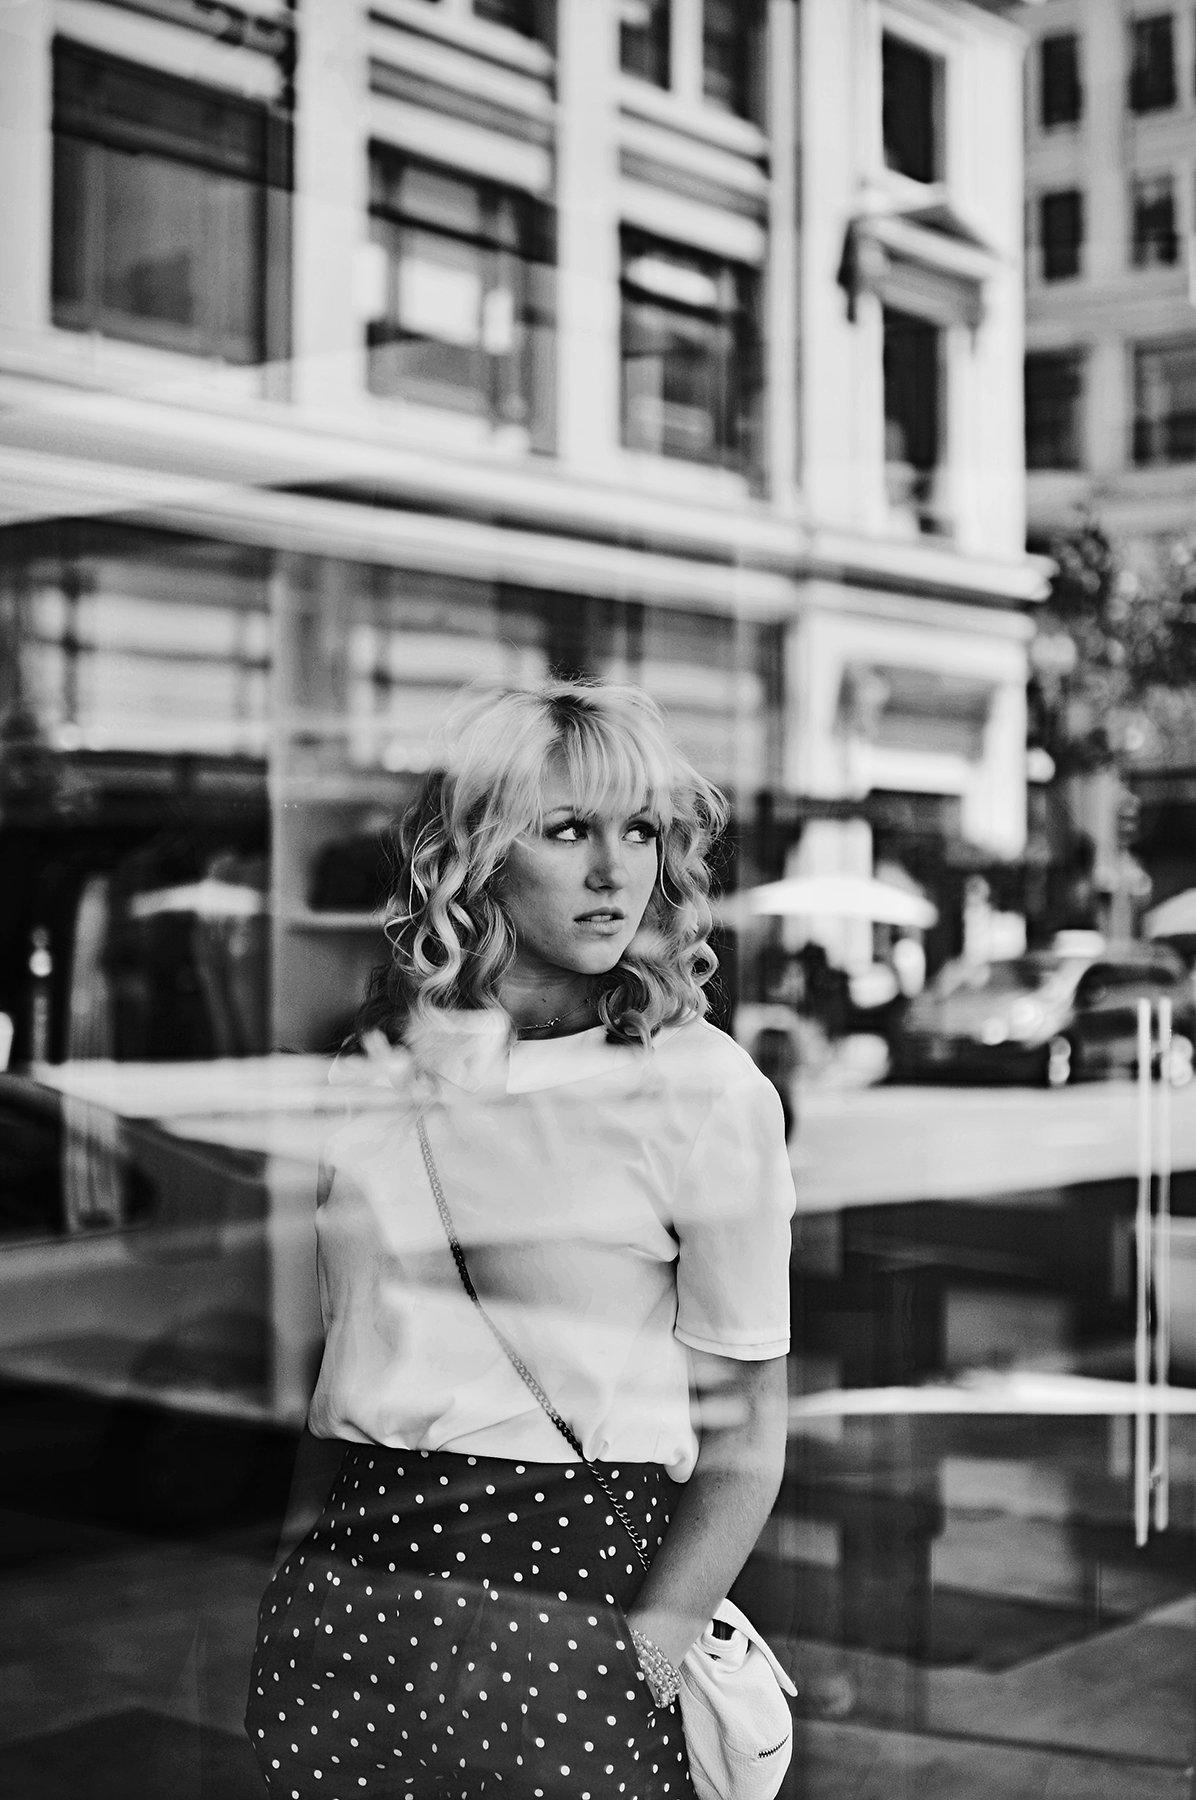 san francisco california senior photos destination portrait photographer bryan newfield photography 07